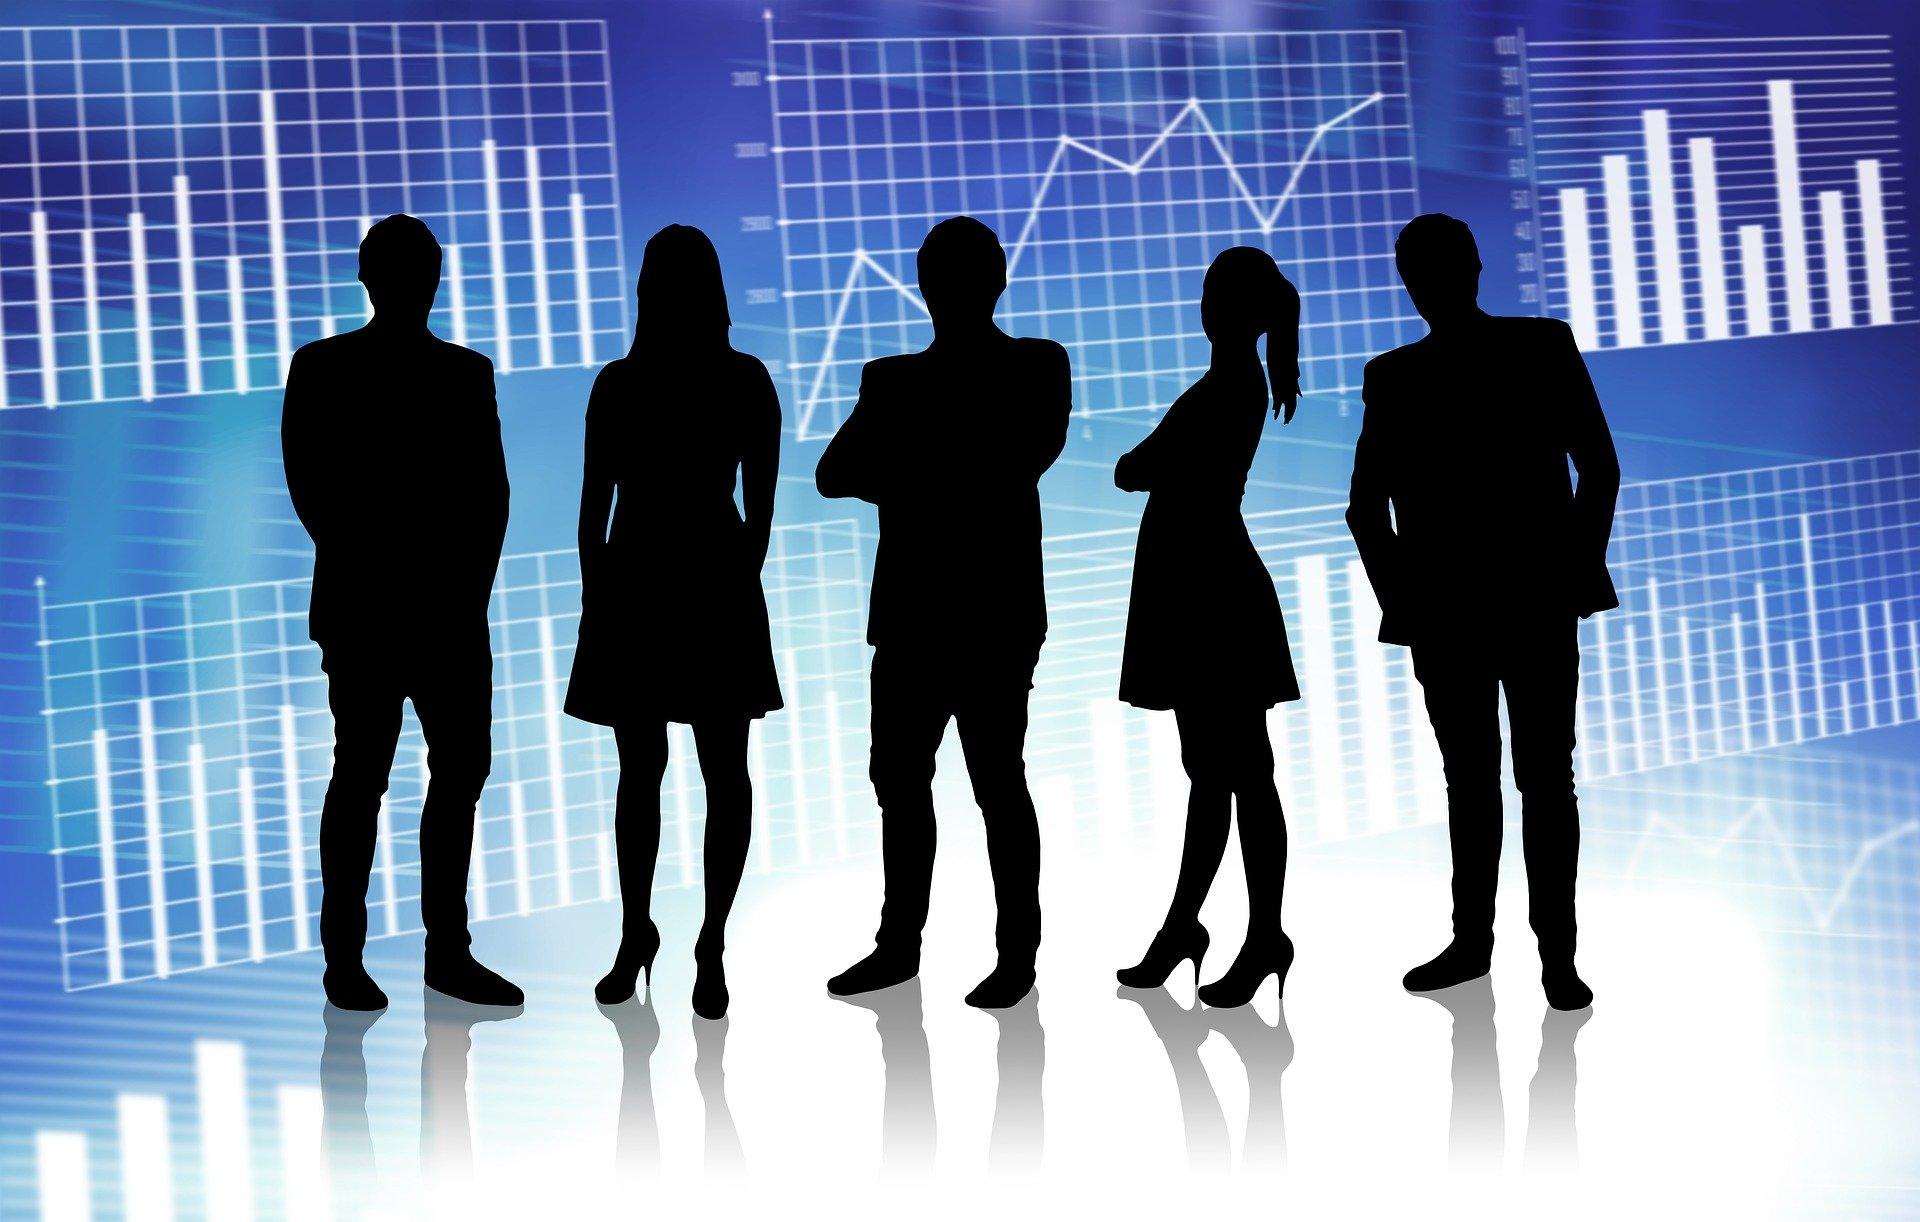 Planificación e iniciativa emprendedora en pequeños negocios o microempresas  Curso para desemplead@s   GRATUITO